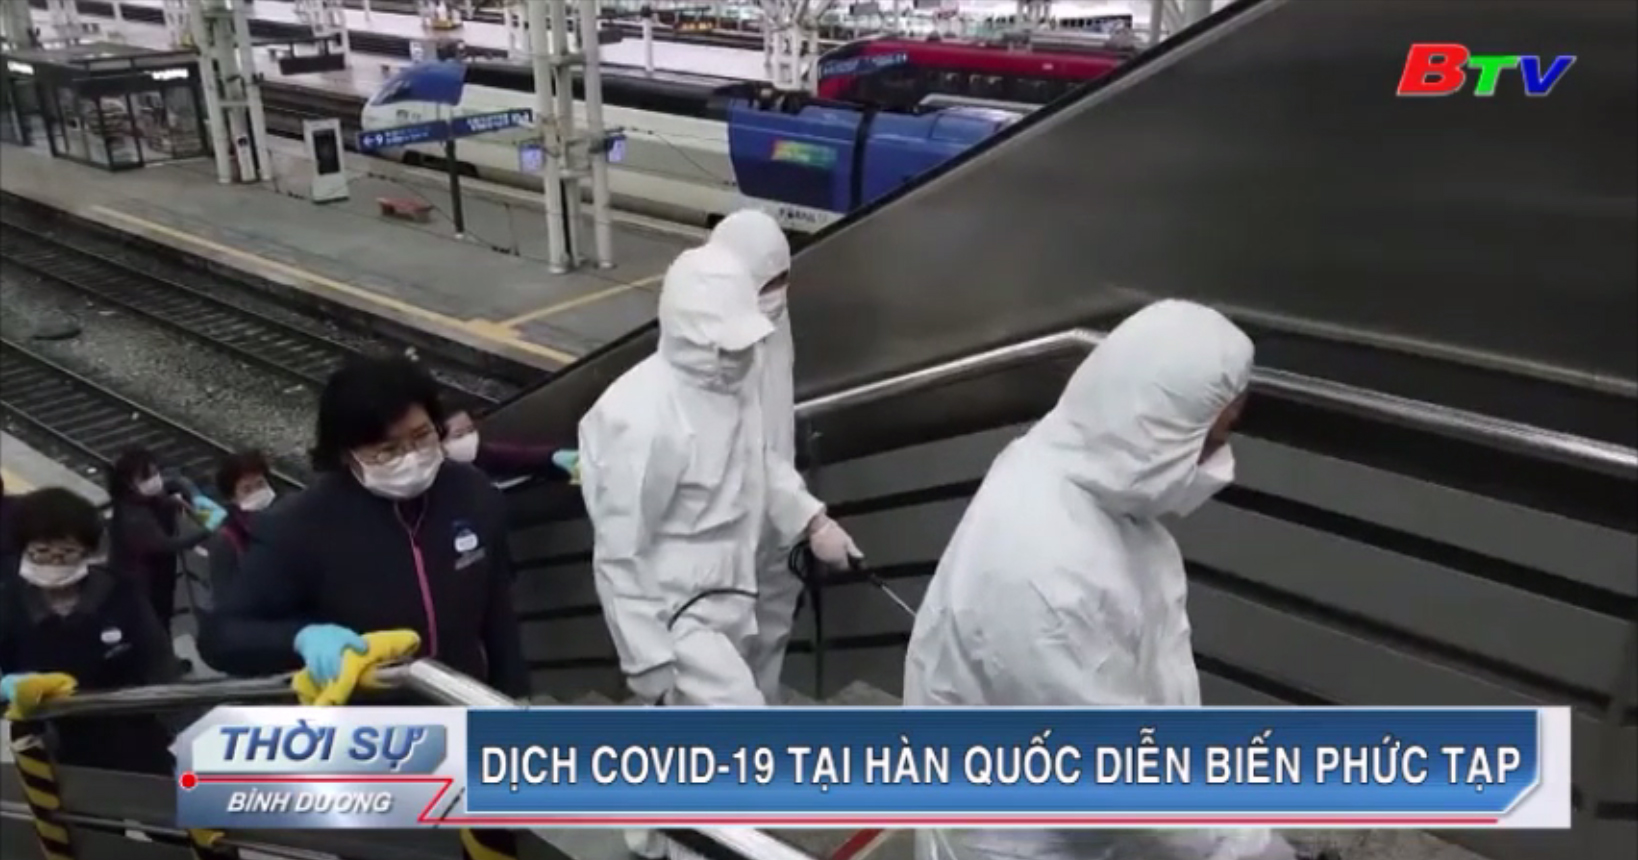 Dịch Covid-19 tại Hàn Quốc diễn biến phức tạp